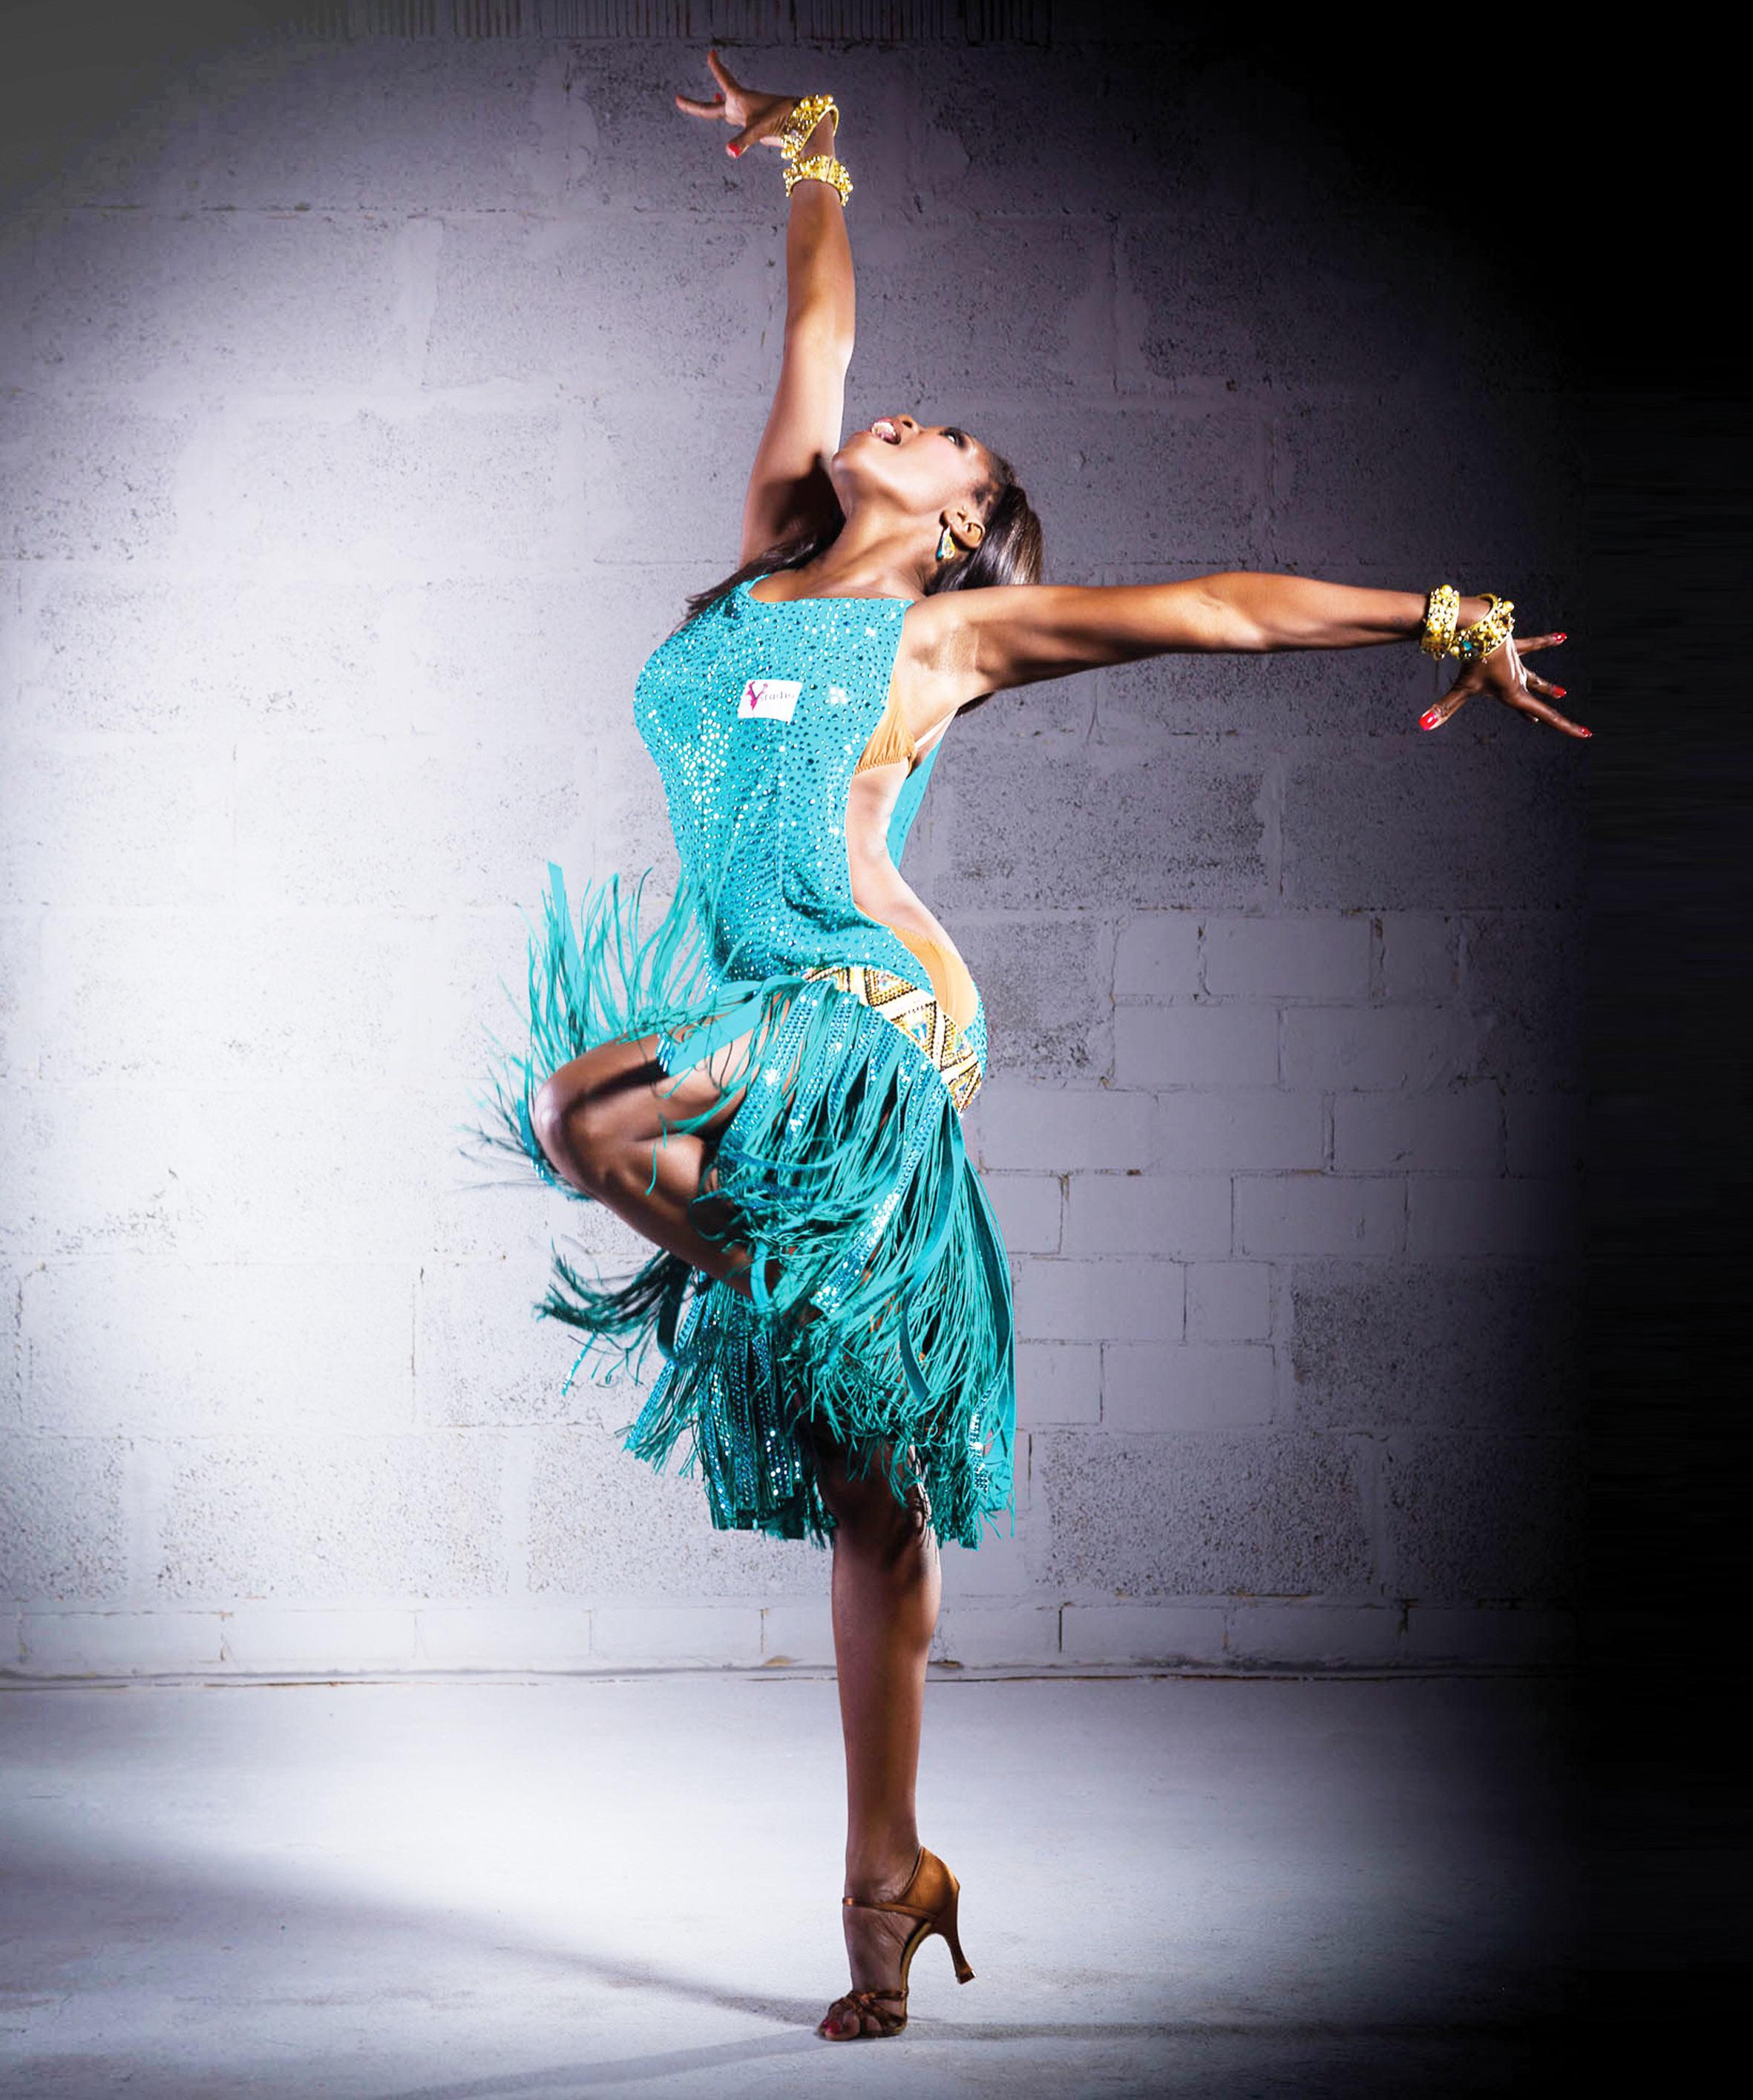 Tanzkleid von V-STUDIO dance fashion